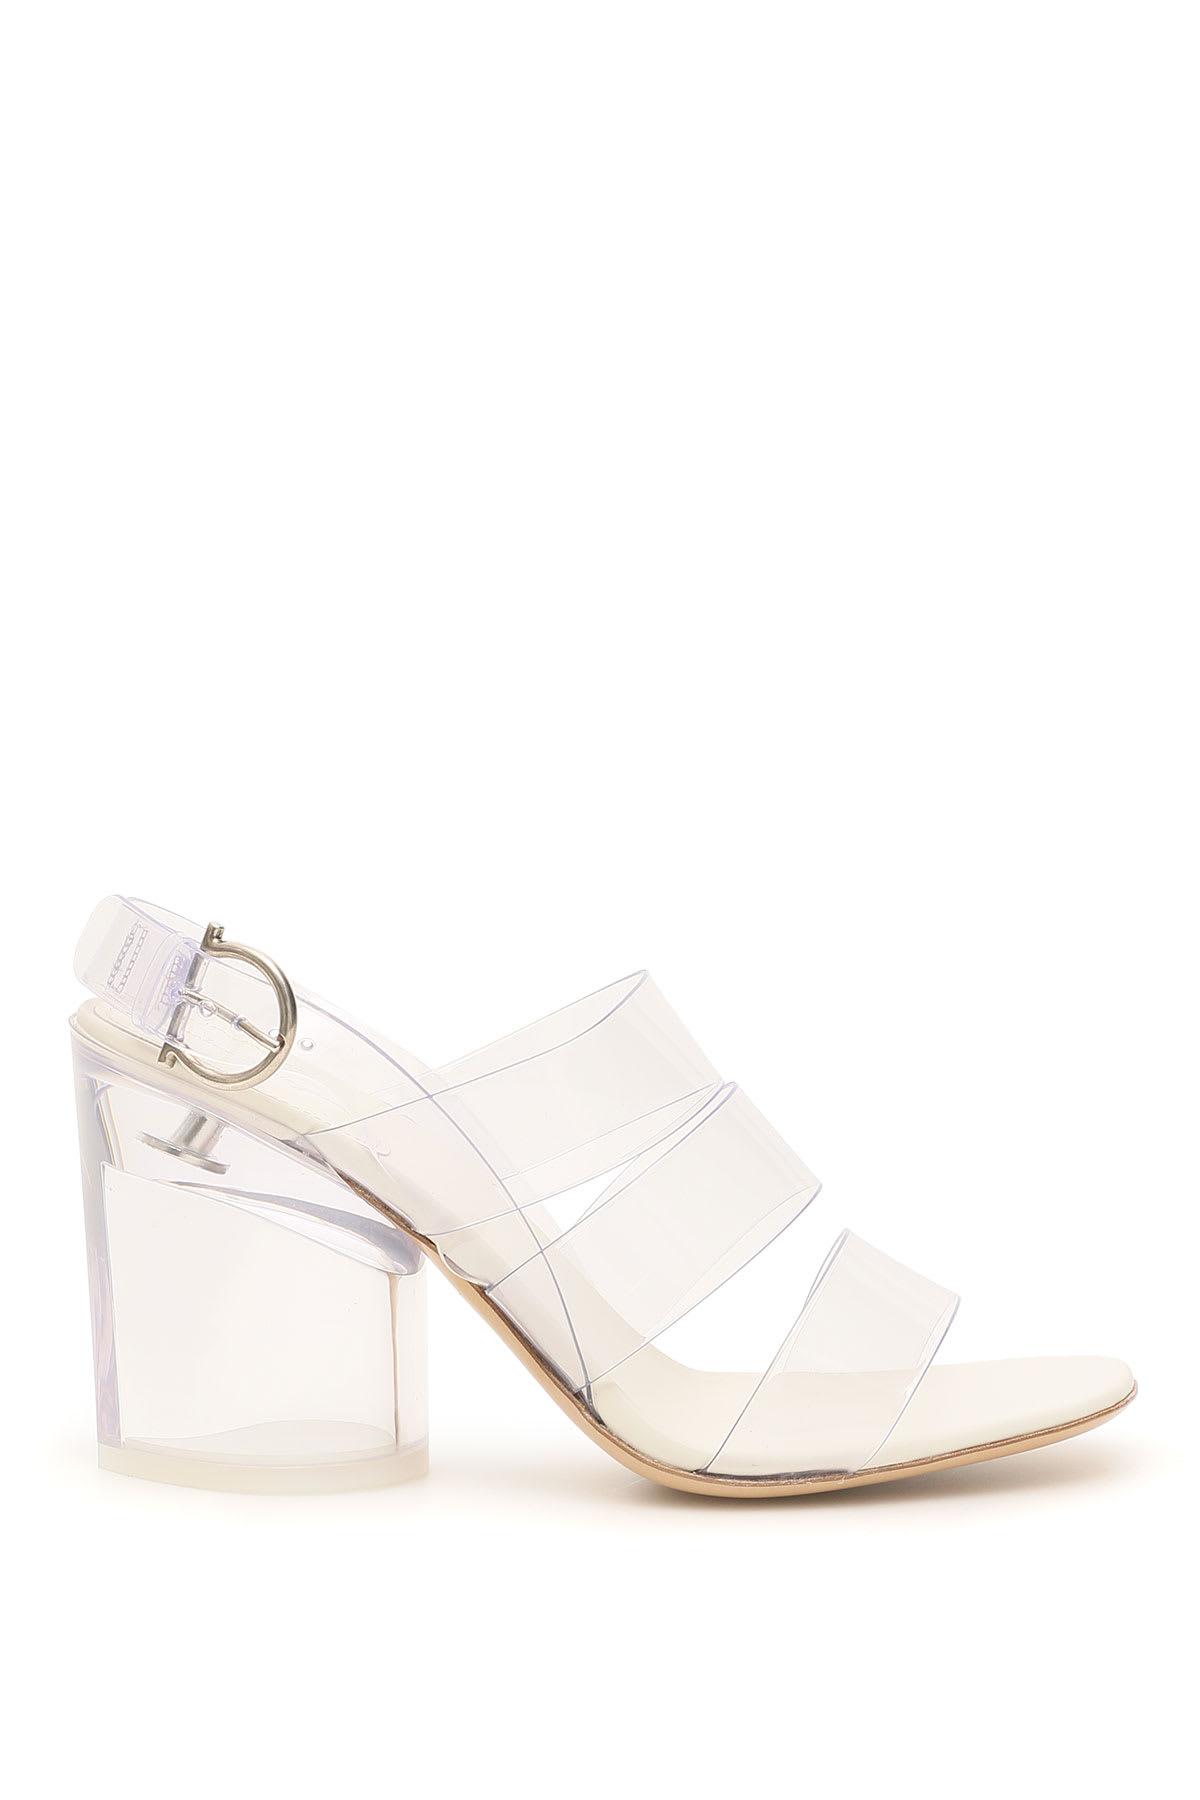 Salvatore Ferragamo Trezze Pvc Sandals 85